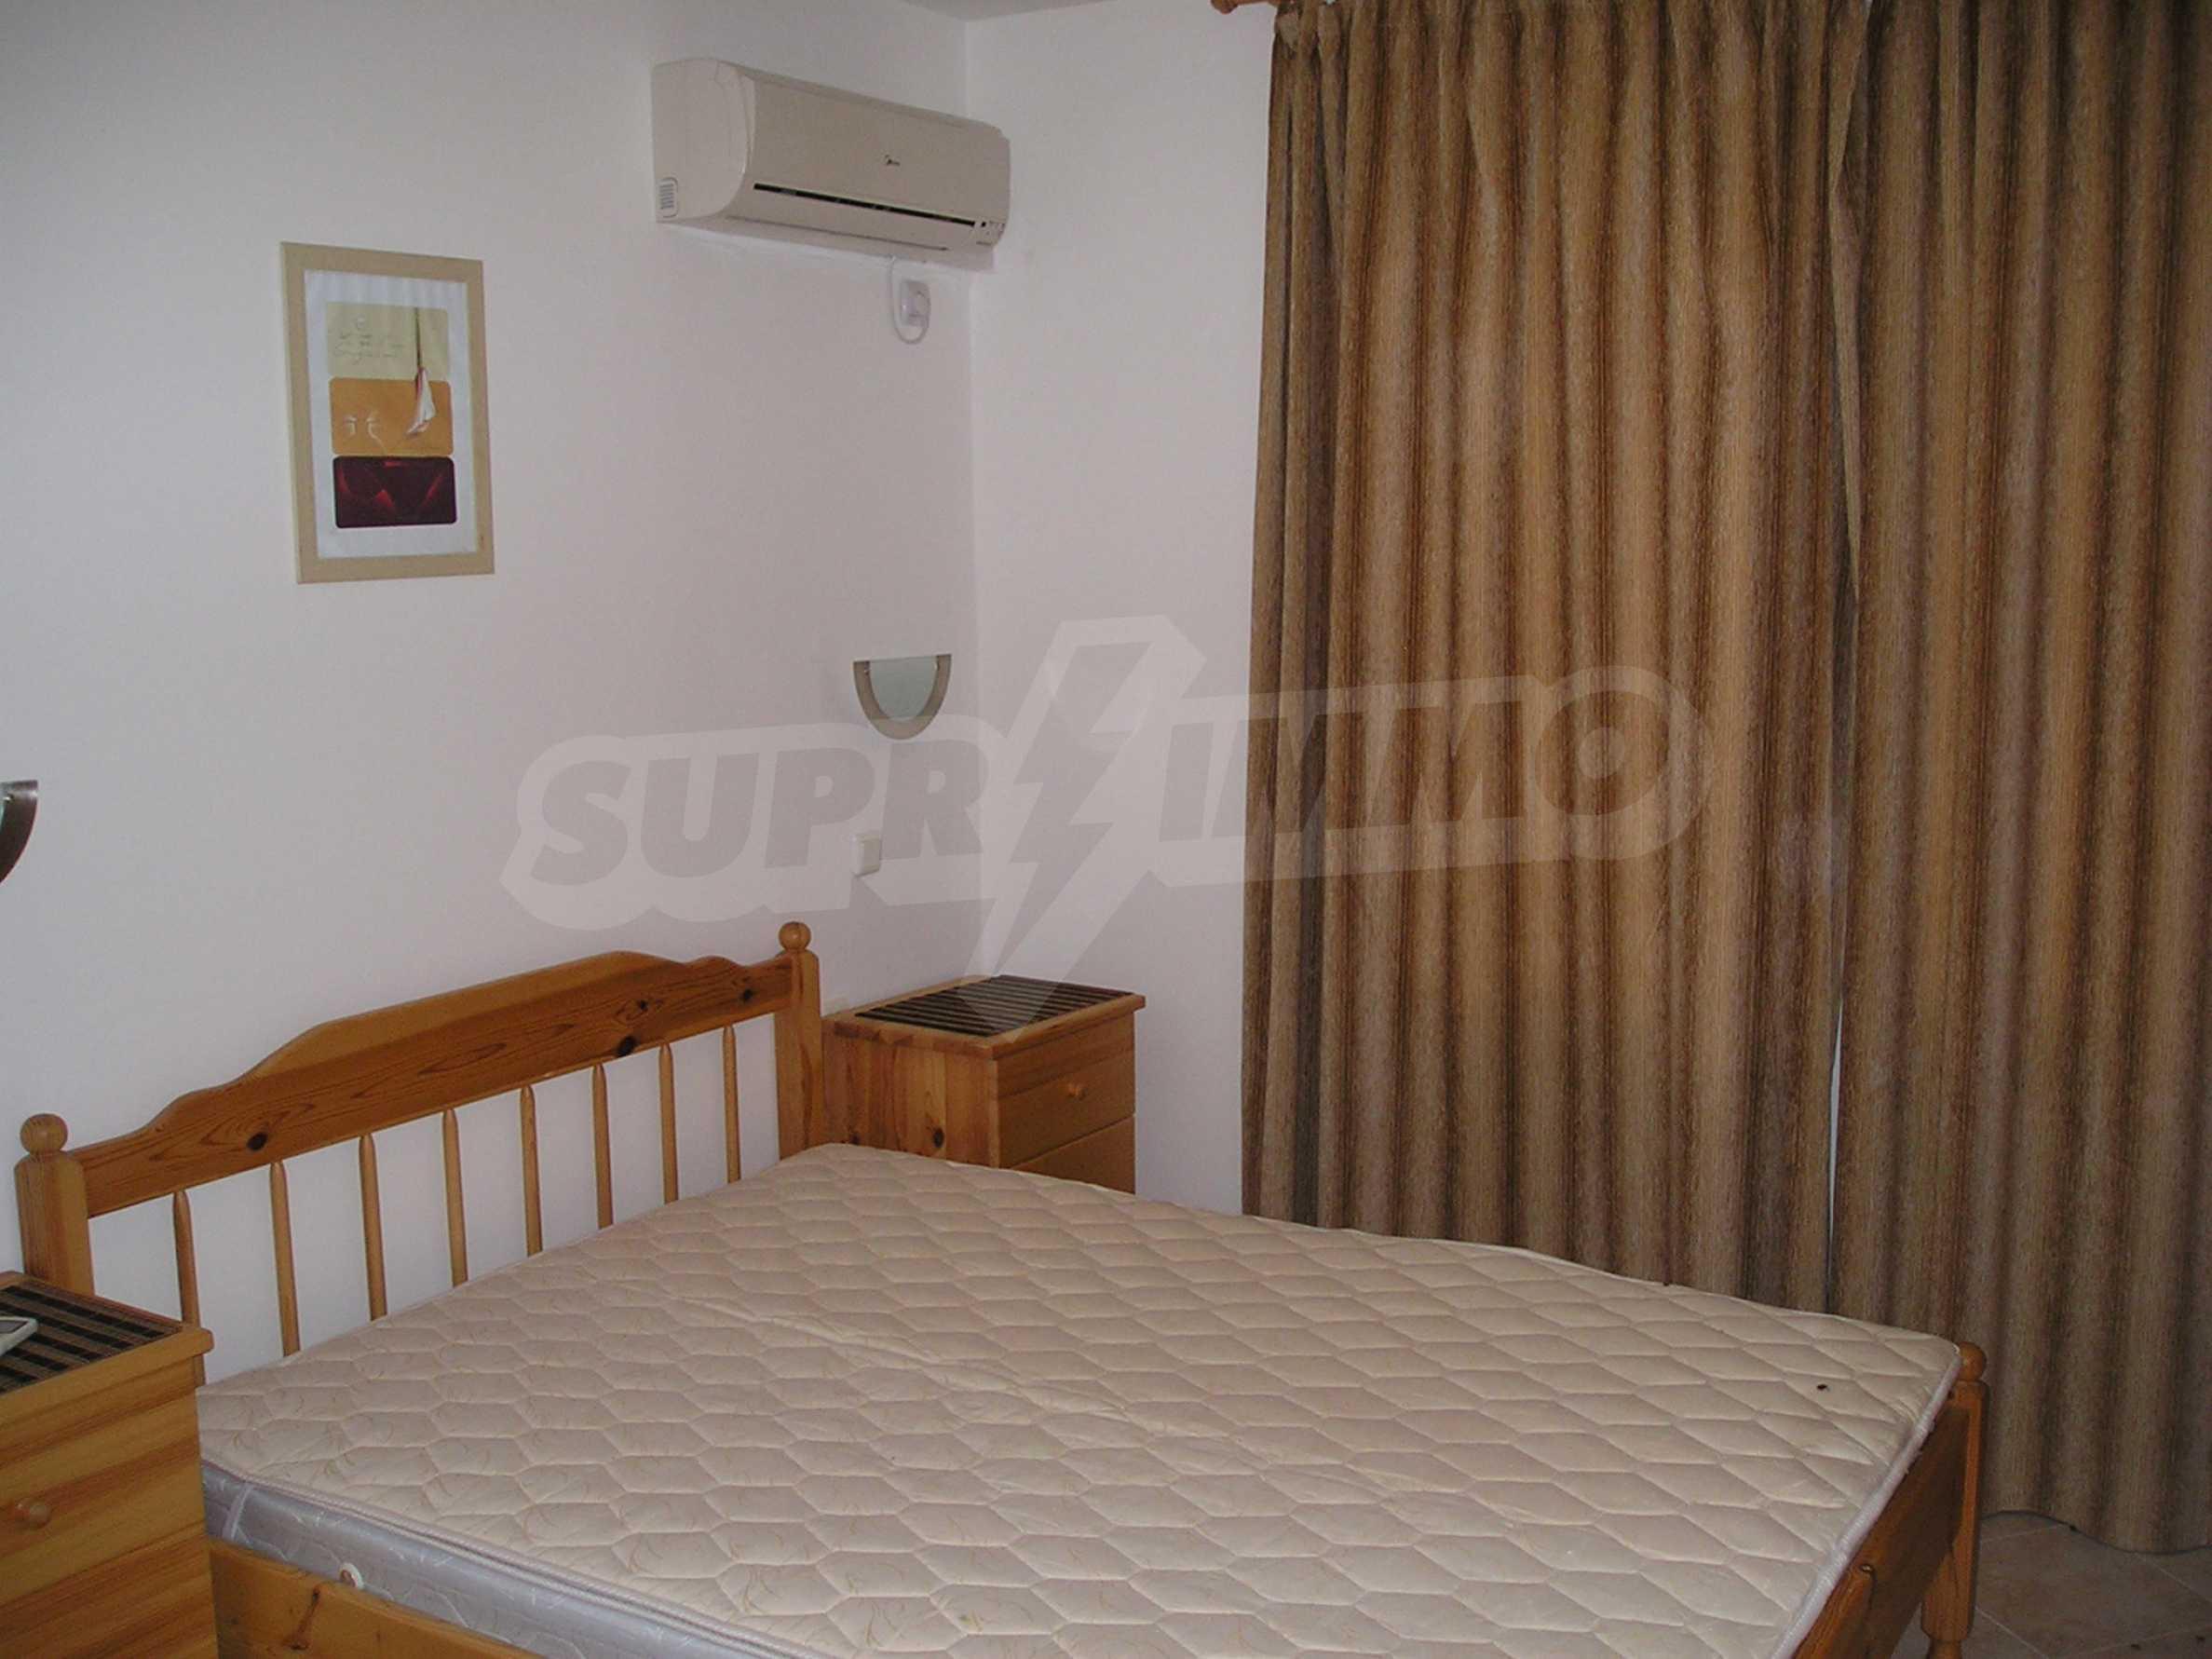 One-bedroom apartment in Sunset Apartments 1 in Kosharitsa 15